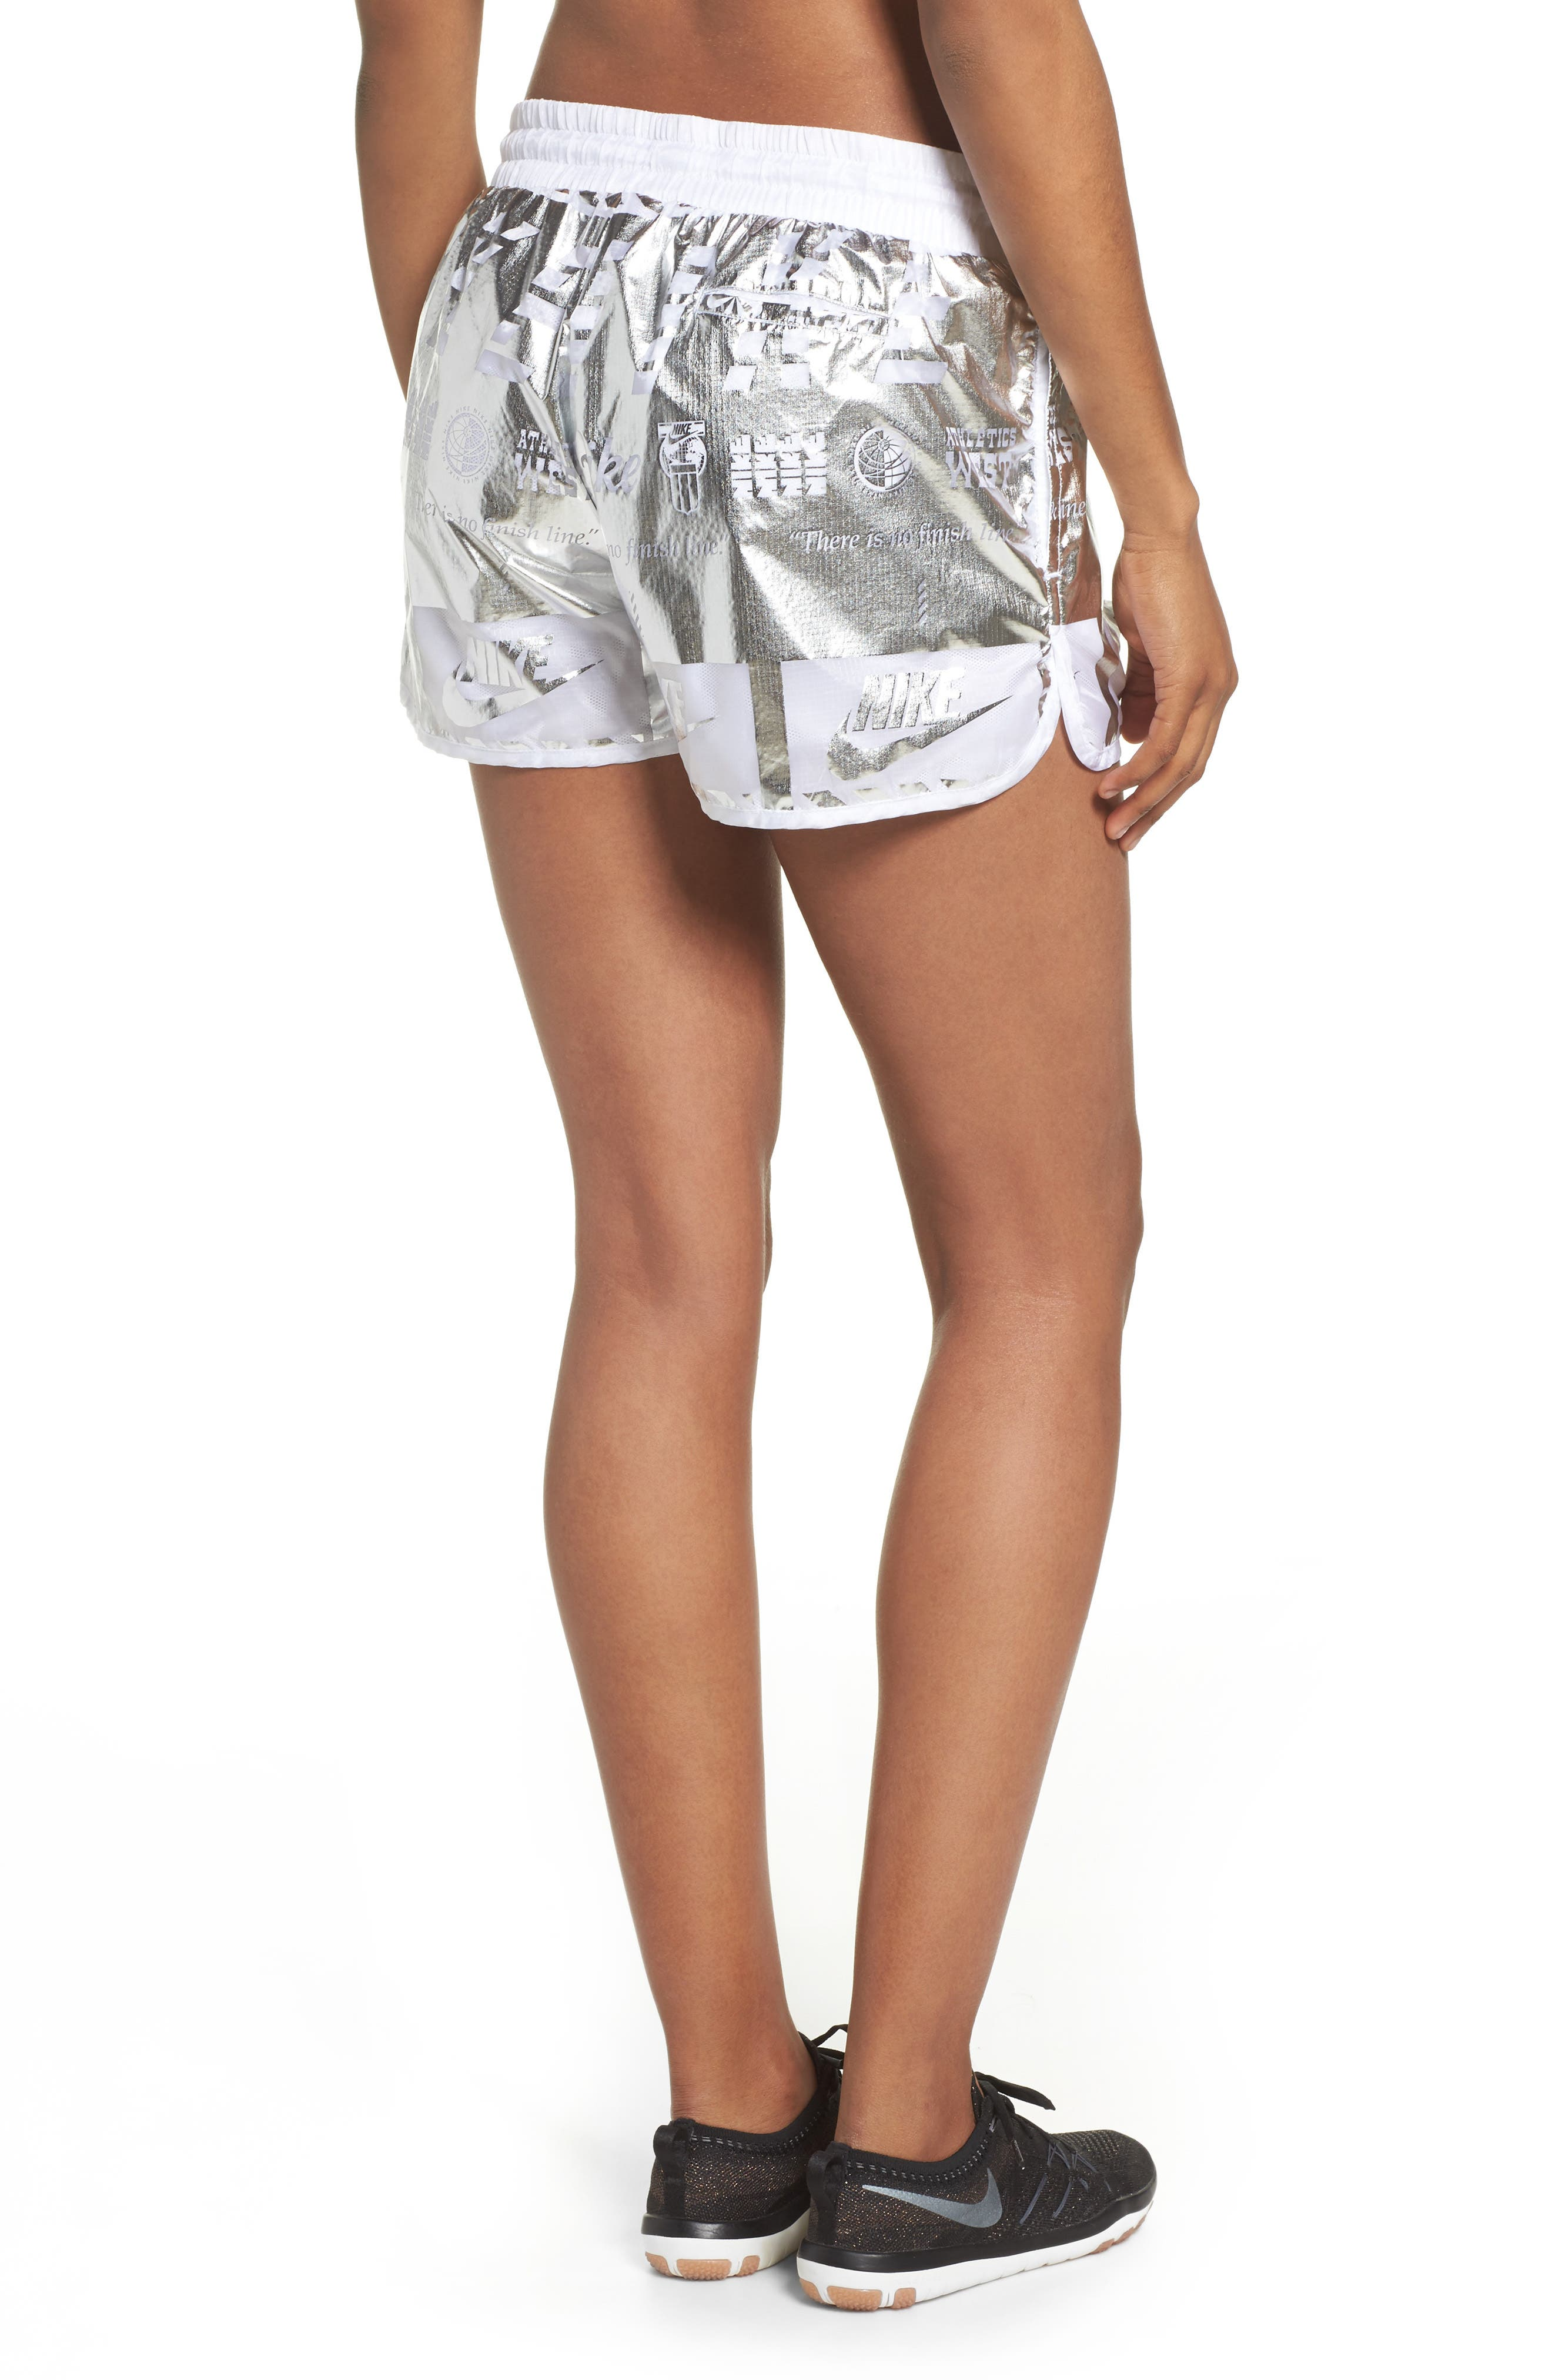 Sportswear Women's Metallic Shorts,                             Alternate thumbnail 2, color,                             White/ White